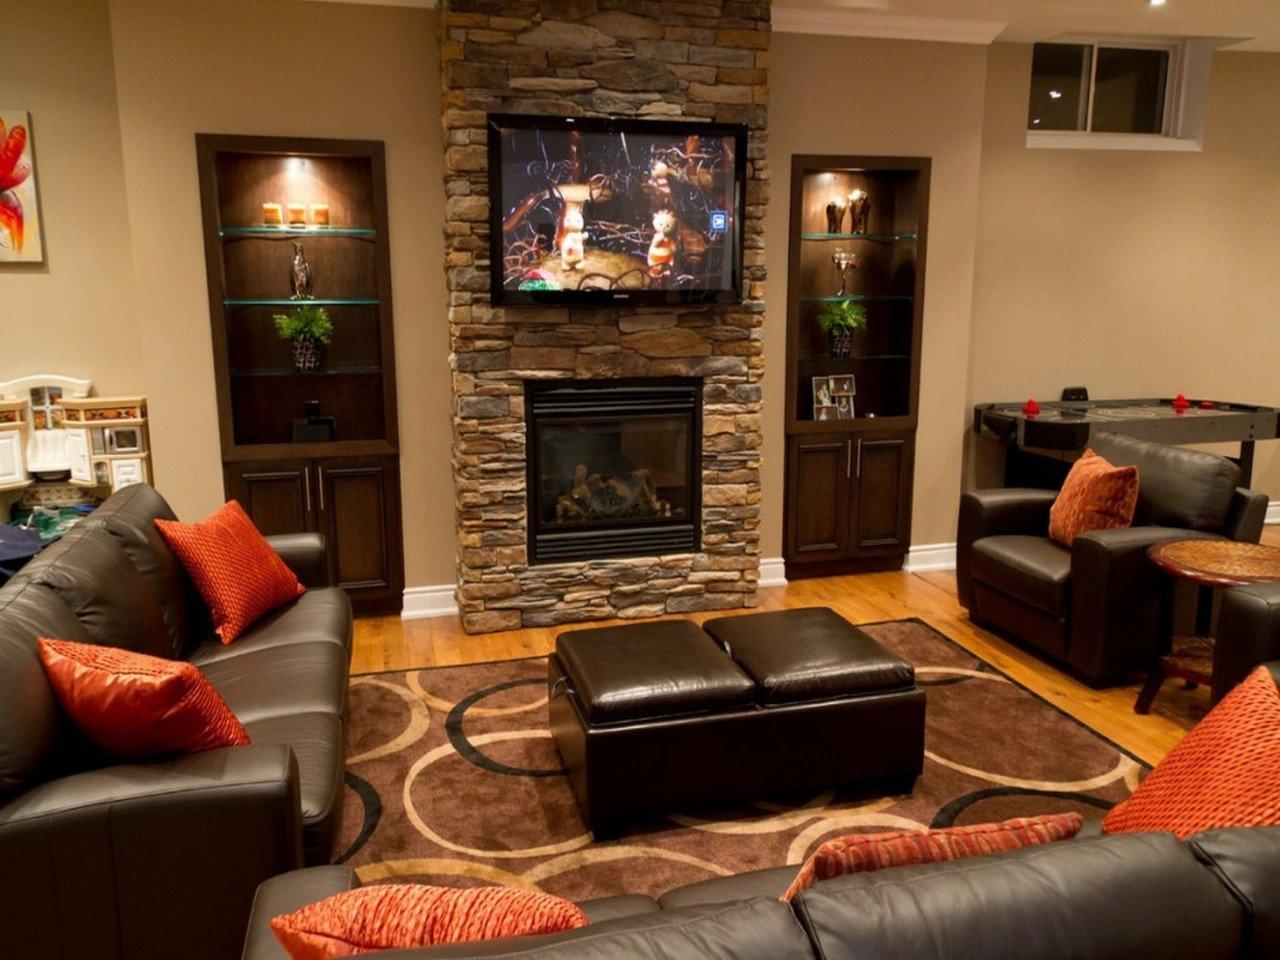 Small Basement Living Room Ideas Fresh Design Your Bedroom Game Small Basement Living Room Ideas Basement Living Room with Fireplace